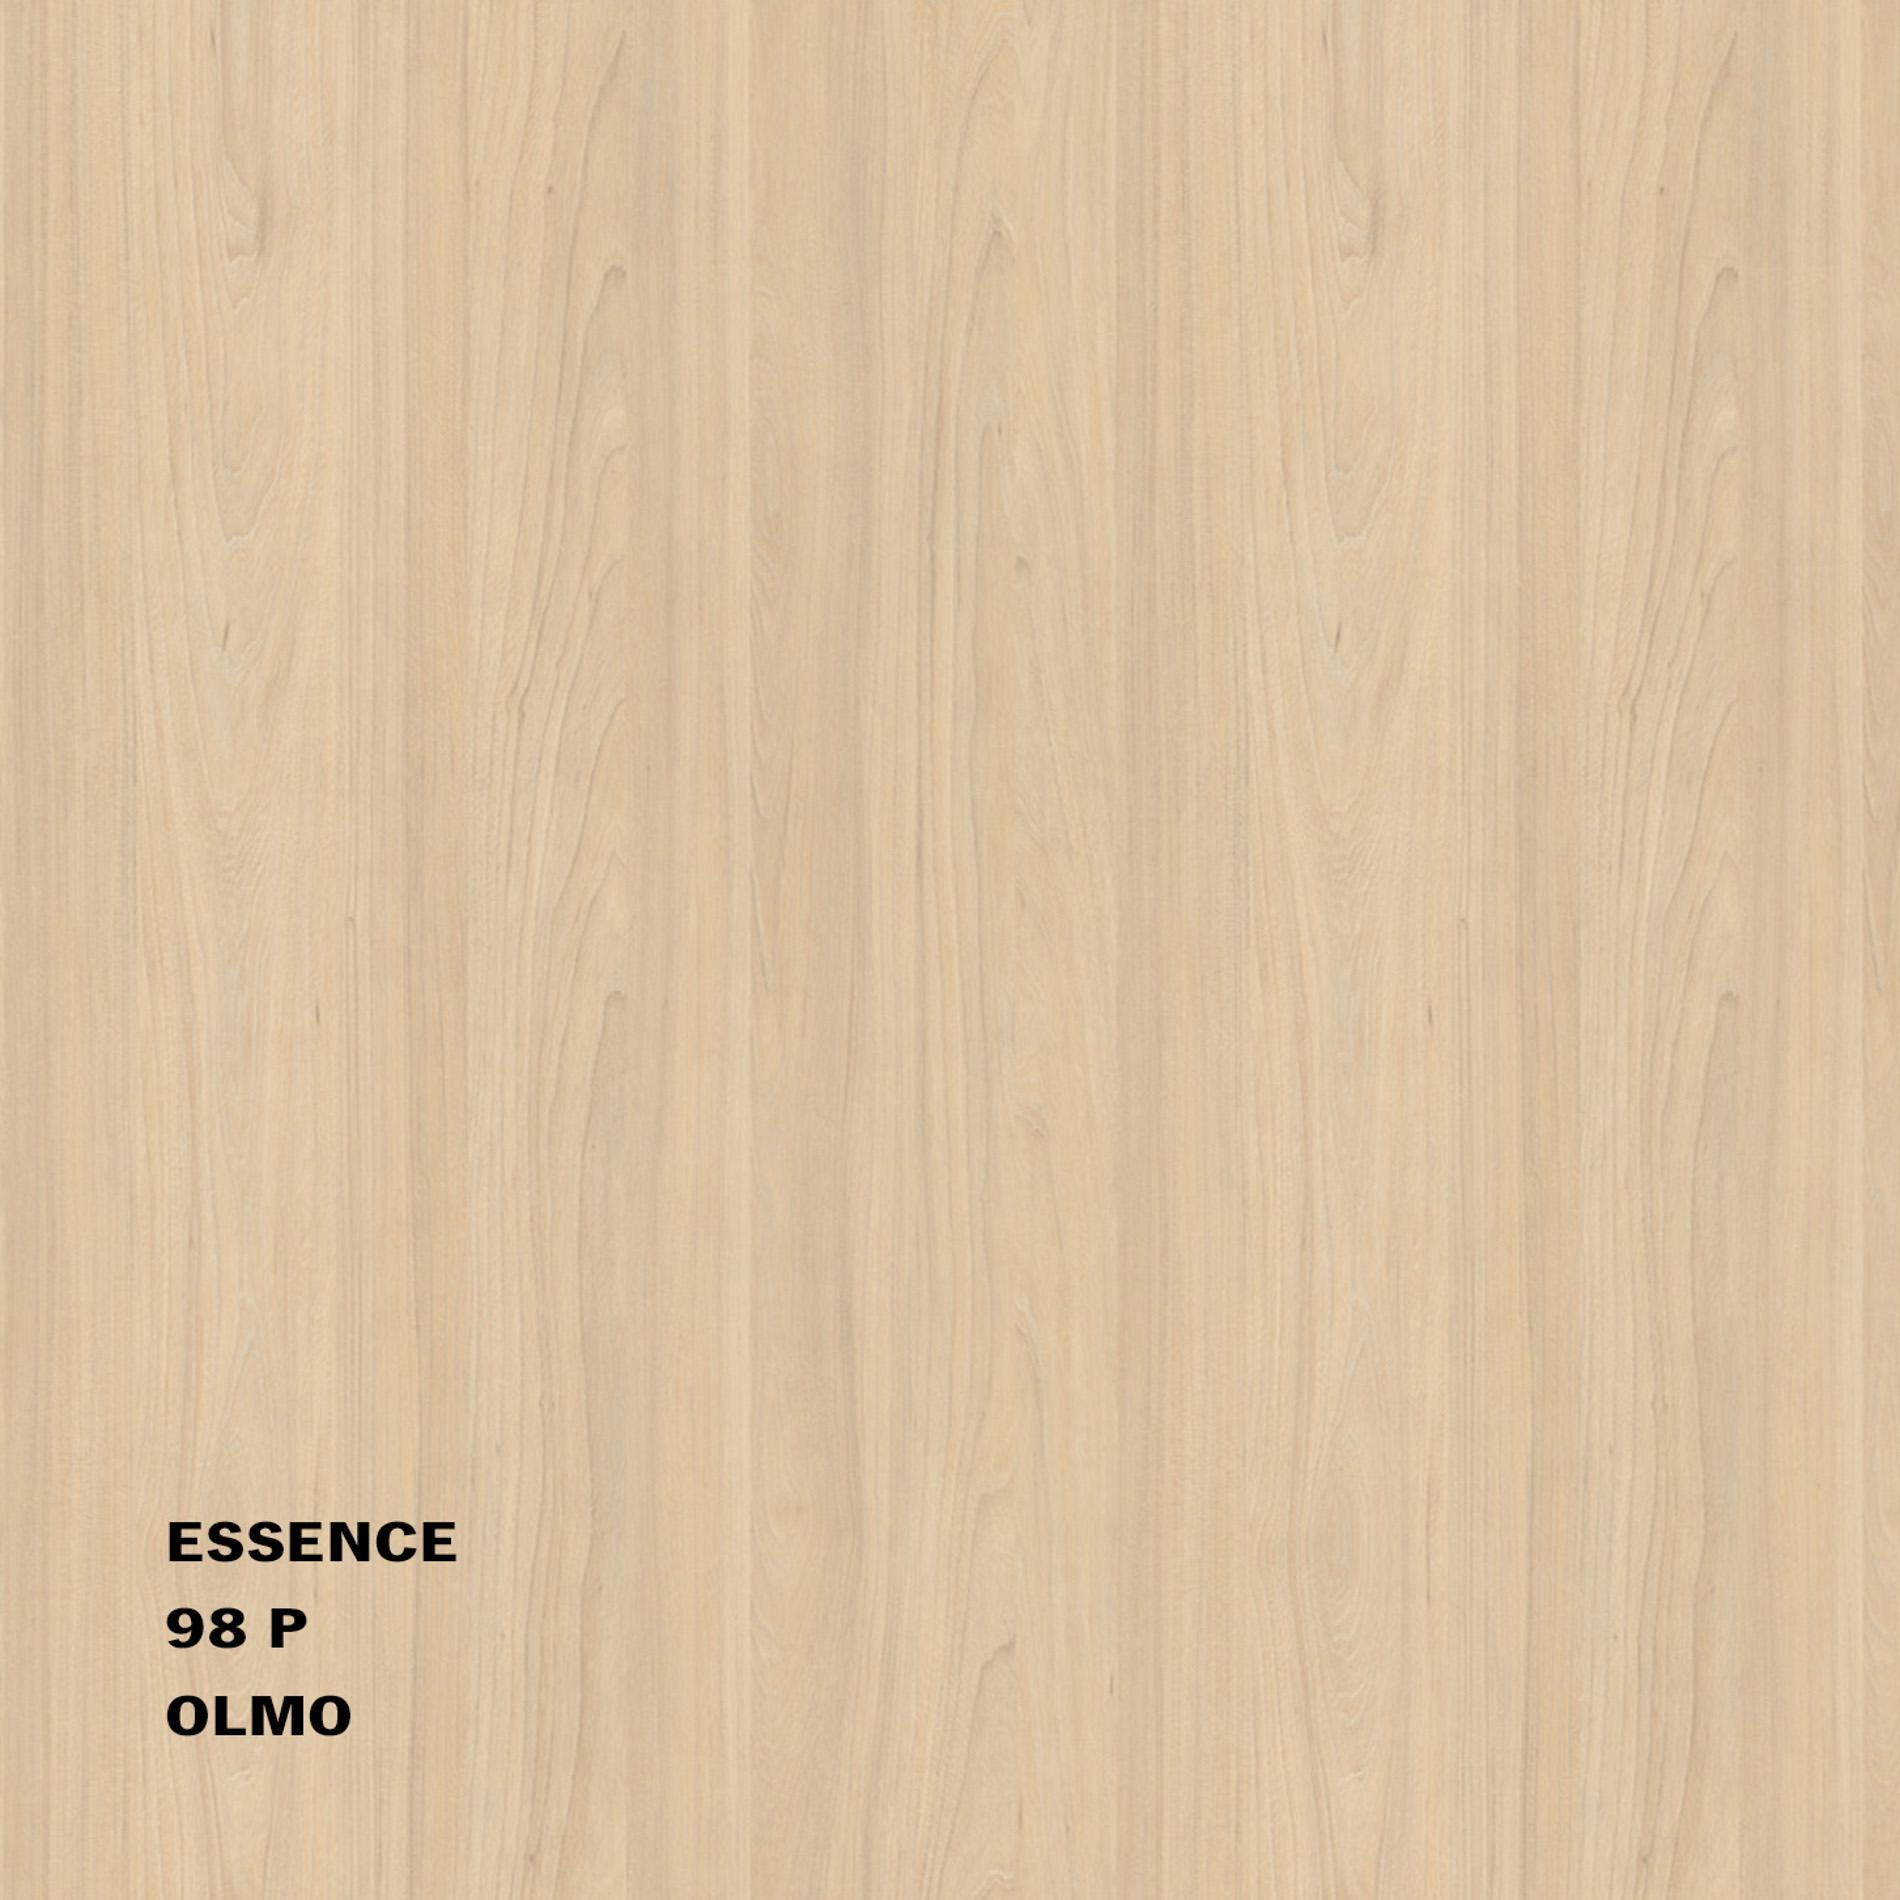 98P_OLMO_ESSENCE